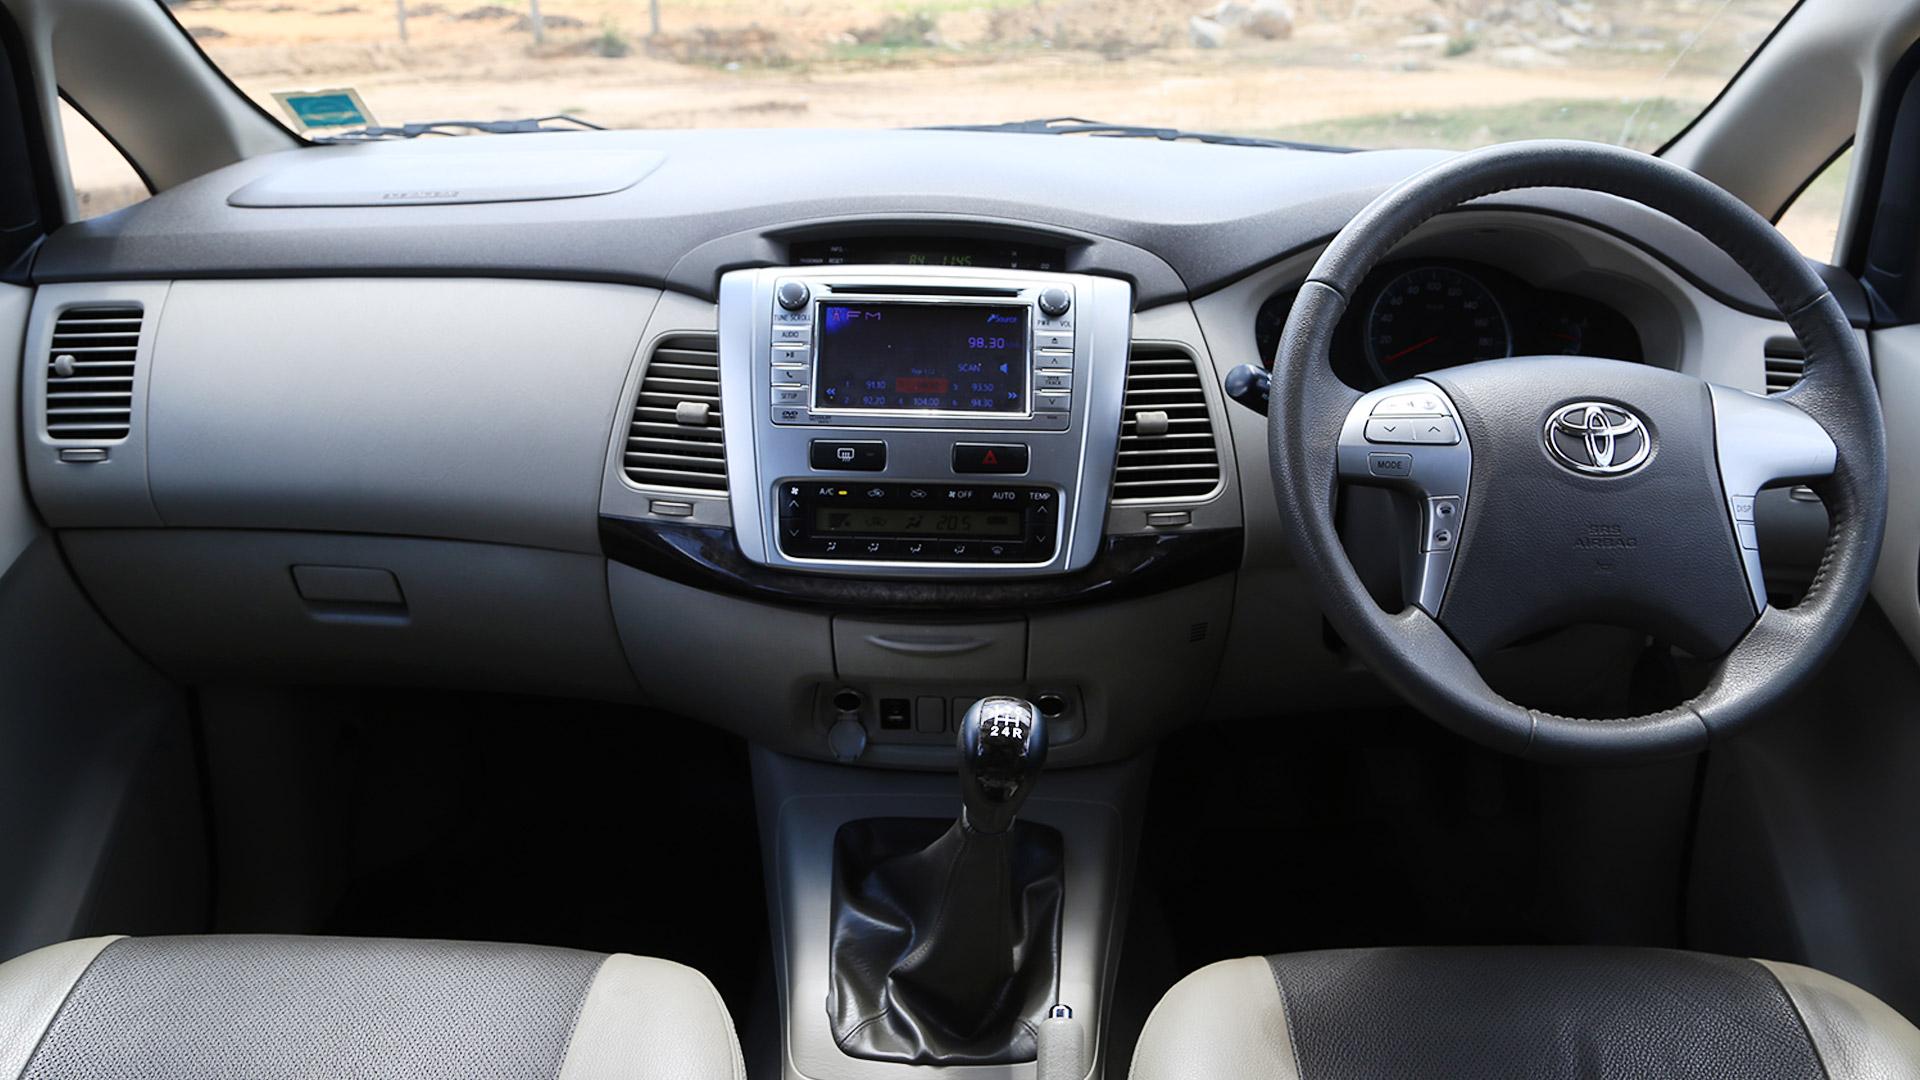 Toyota Innova 2015 2.5G 7 Seater Compare